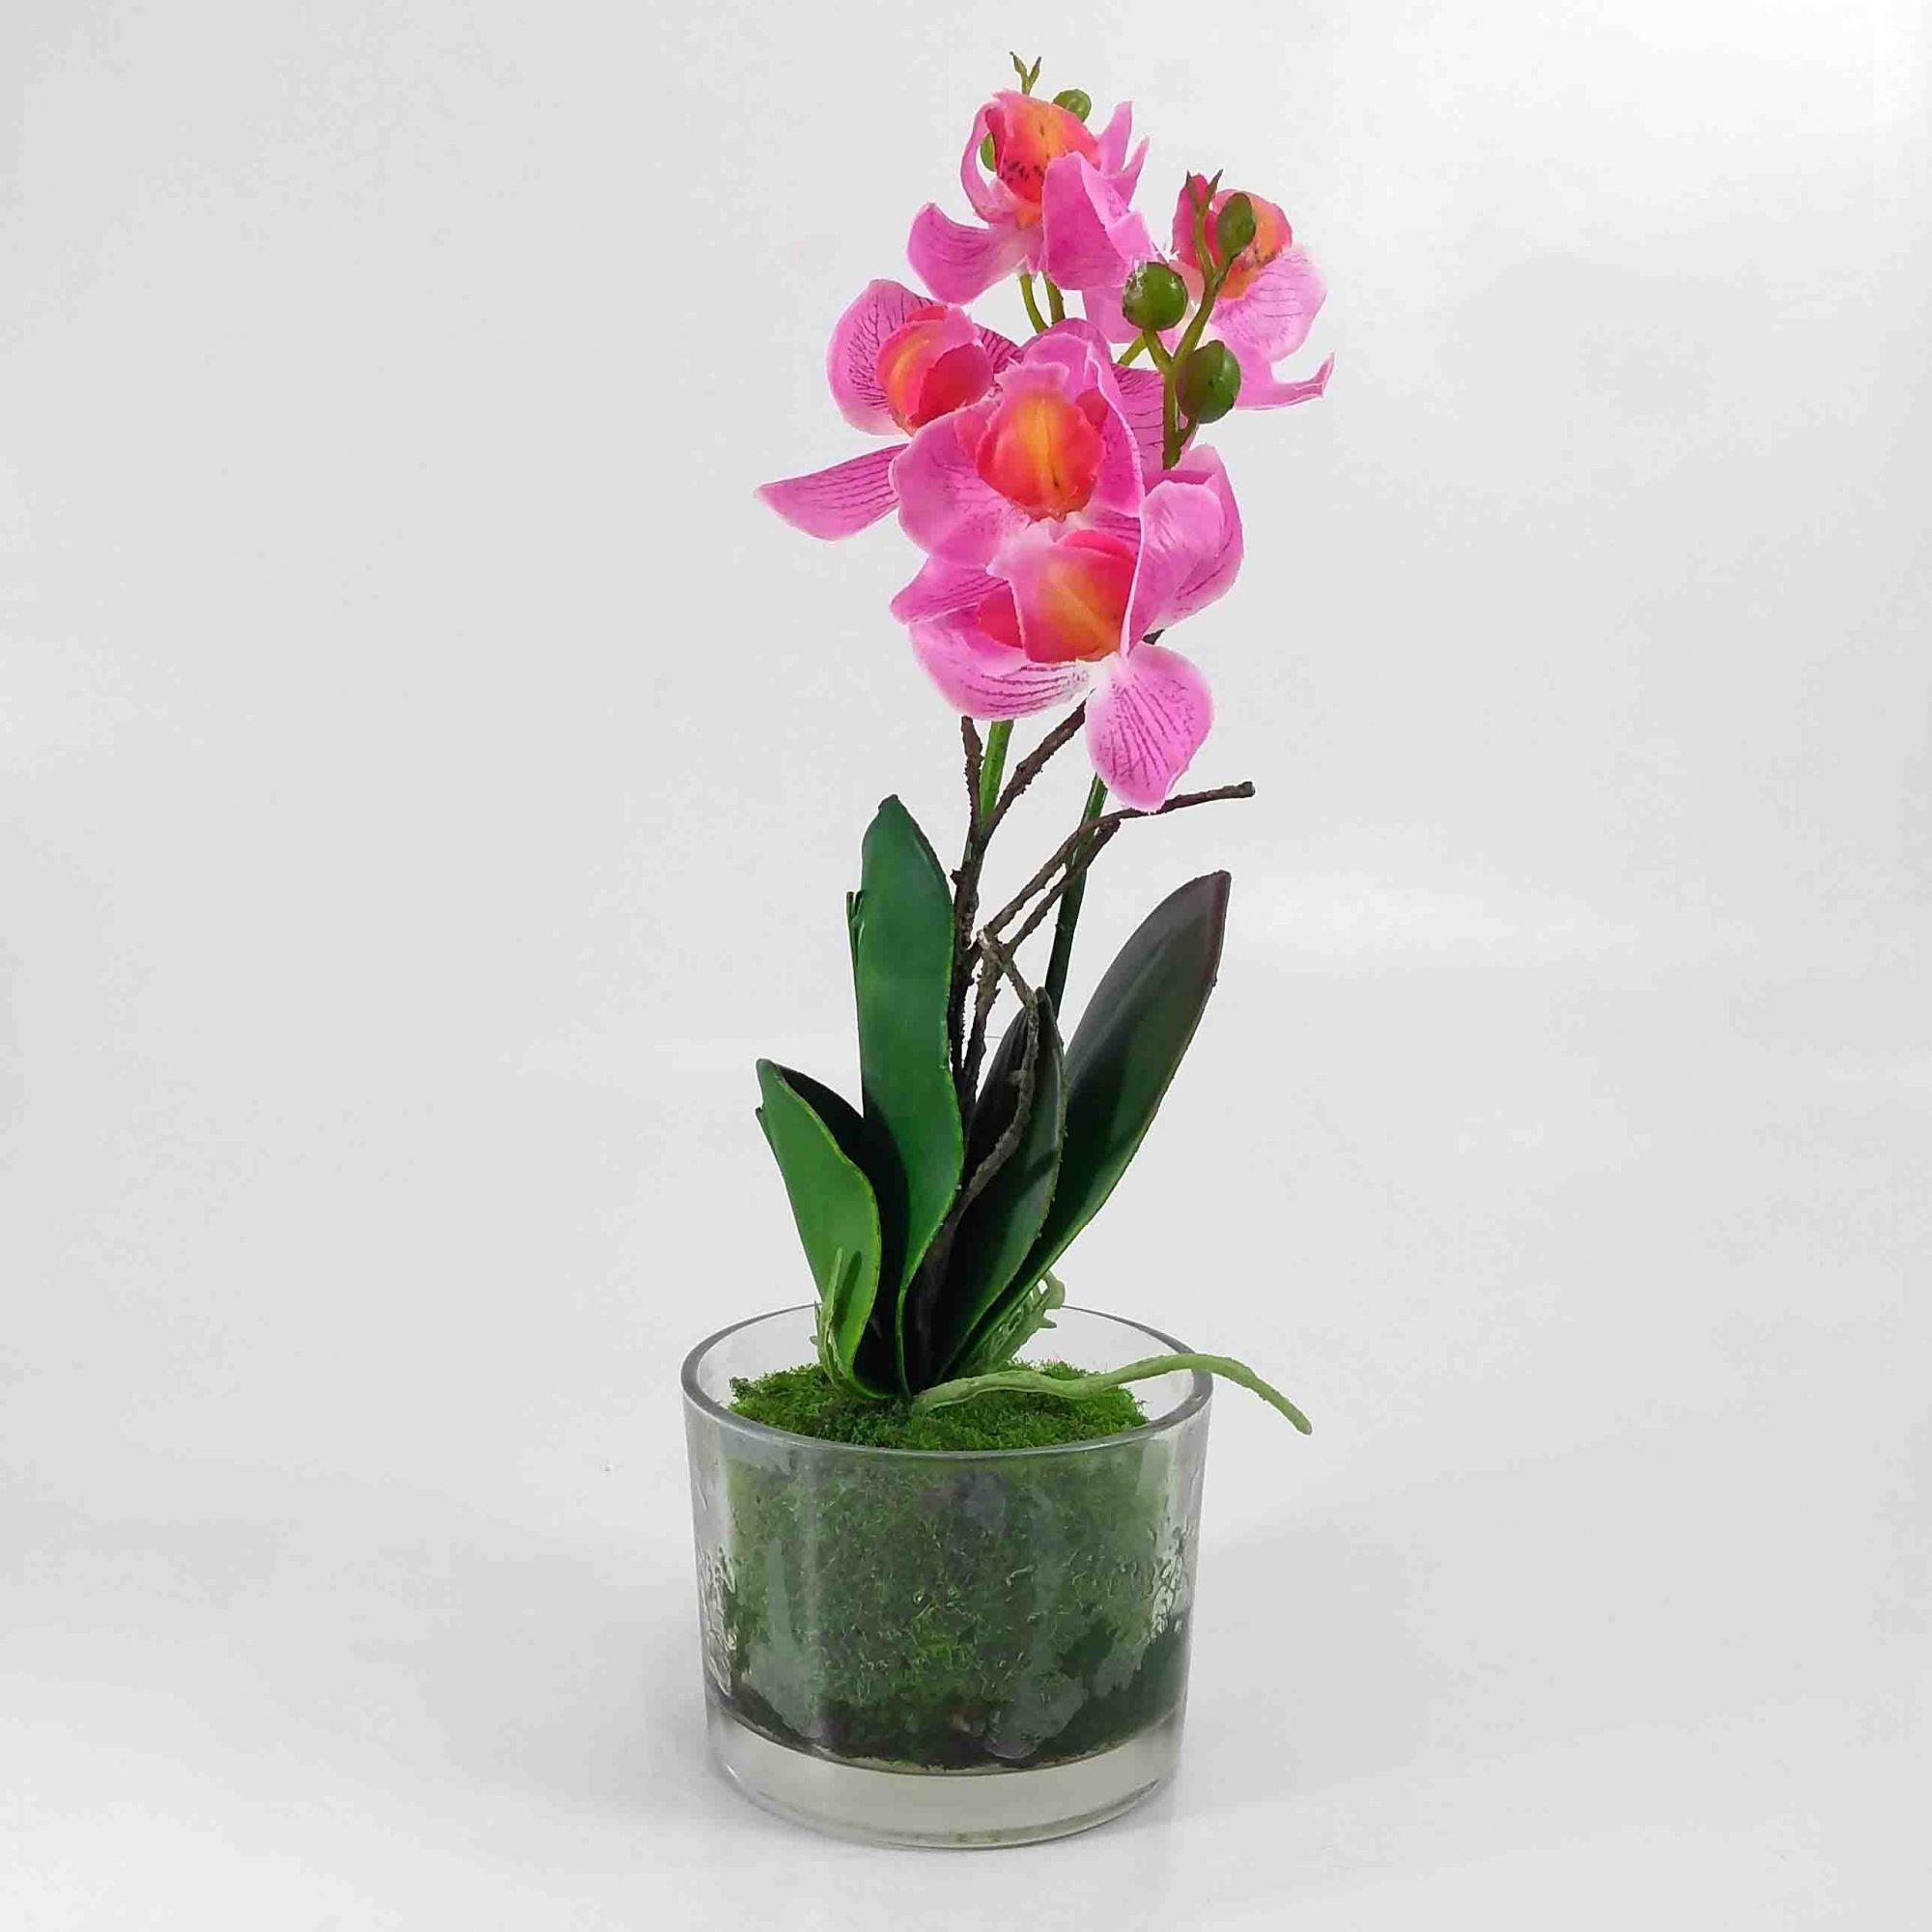 Flor Orquidea Phalaenopsis X5 Cor Rosa C/ Vaso Vidro Artificial Permanente 25CM 36679-001